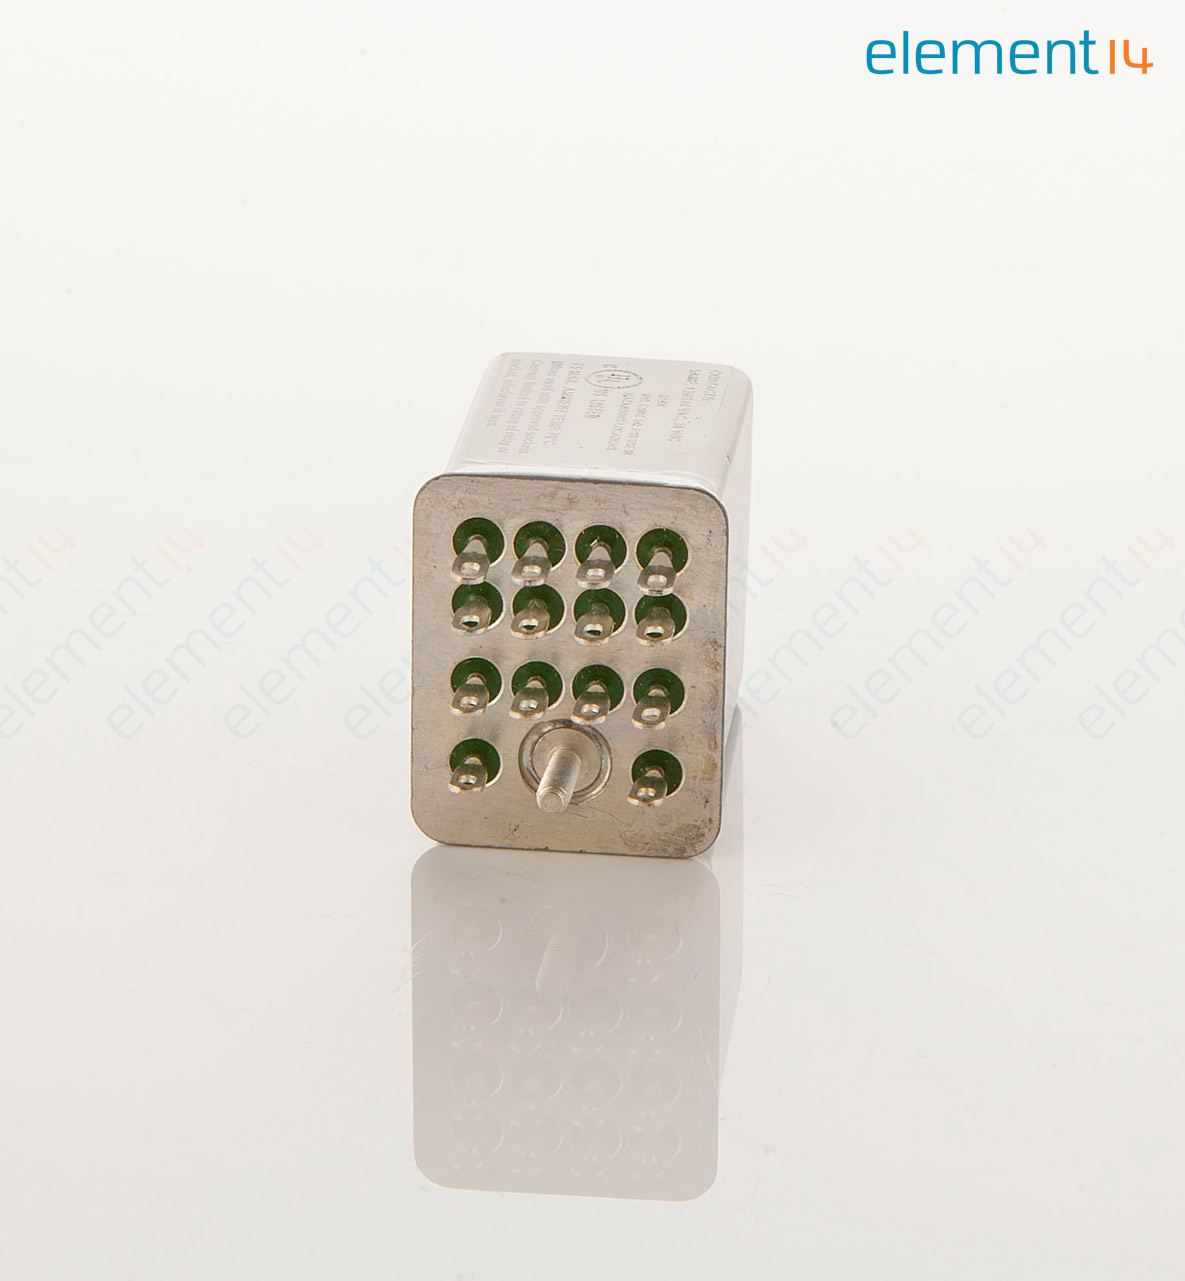 Khs 17d12 24 te connectivity power relay 4pdt 24 vdc khs 17d12 24 ccuart Gallery